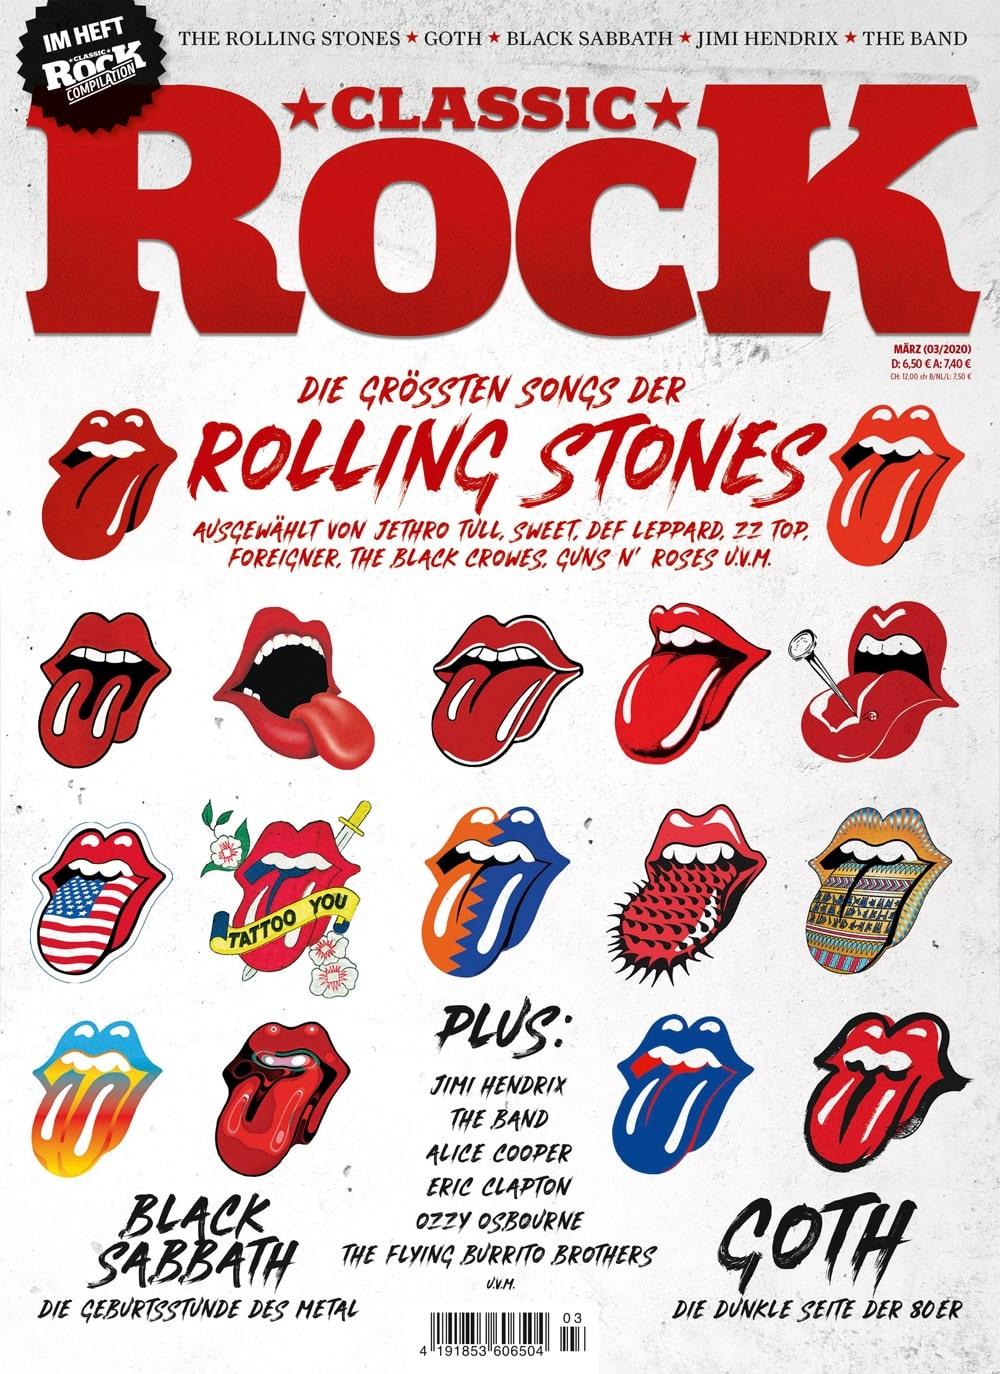 Classic Rock Rolling Stones Titel